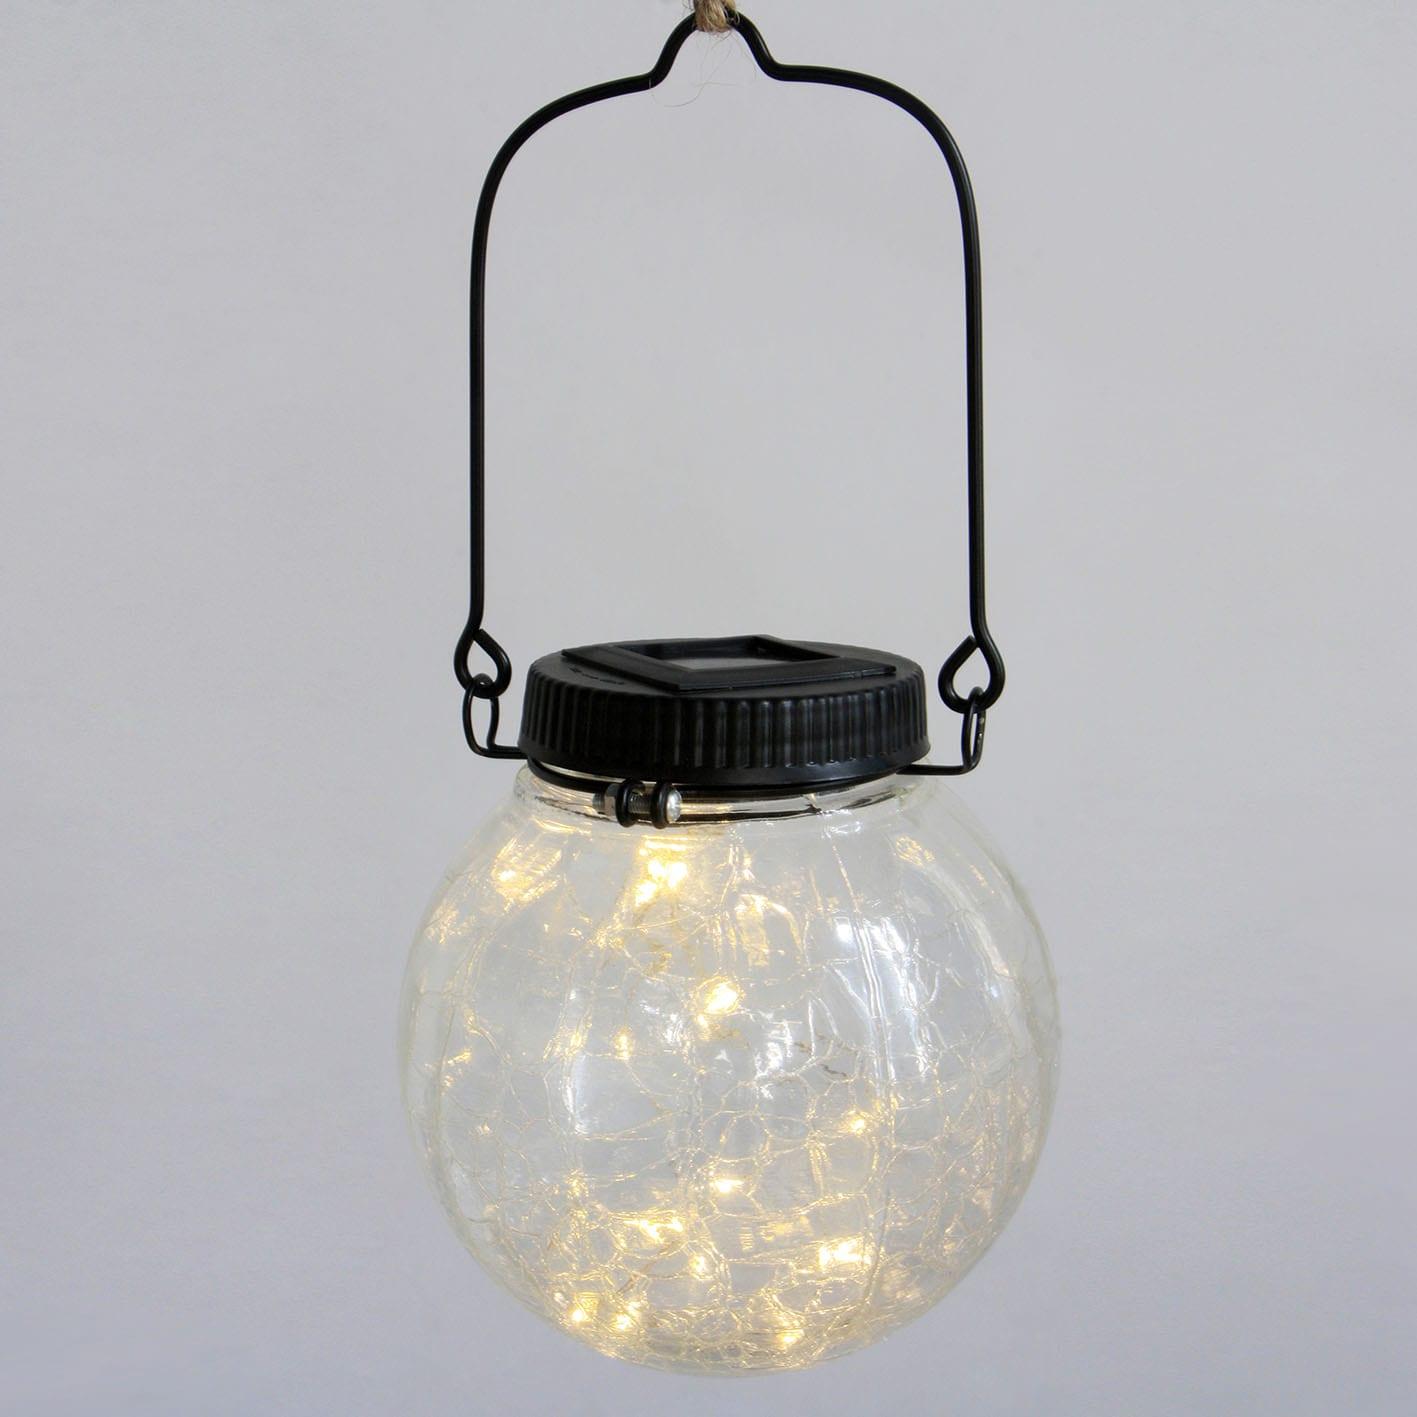 Glass Solar Lantern Fairy Lights Hanging Decor Featured Image